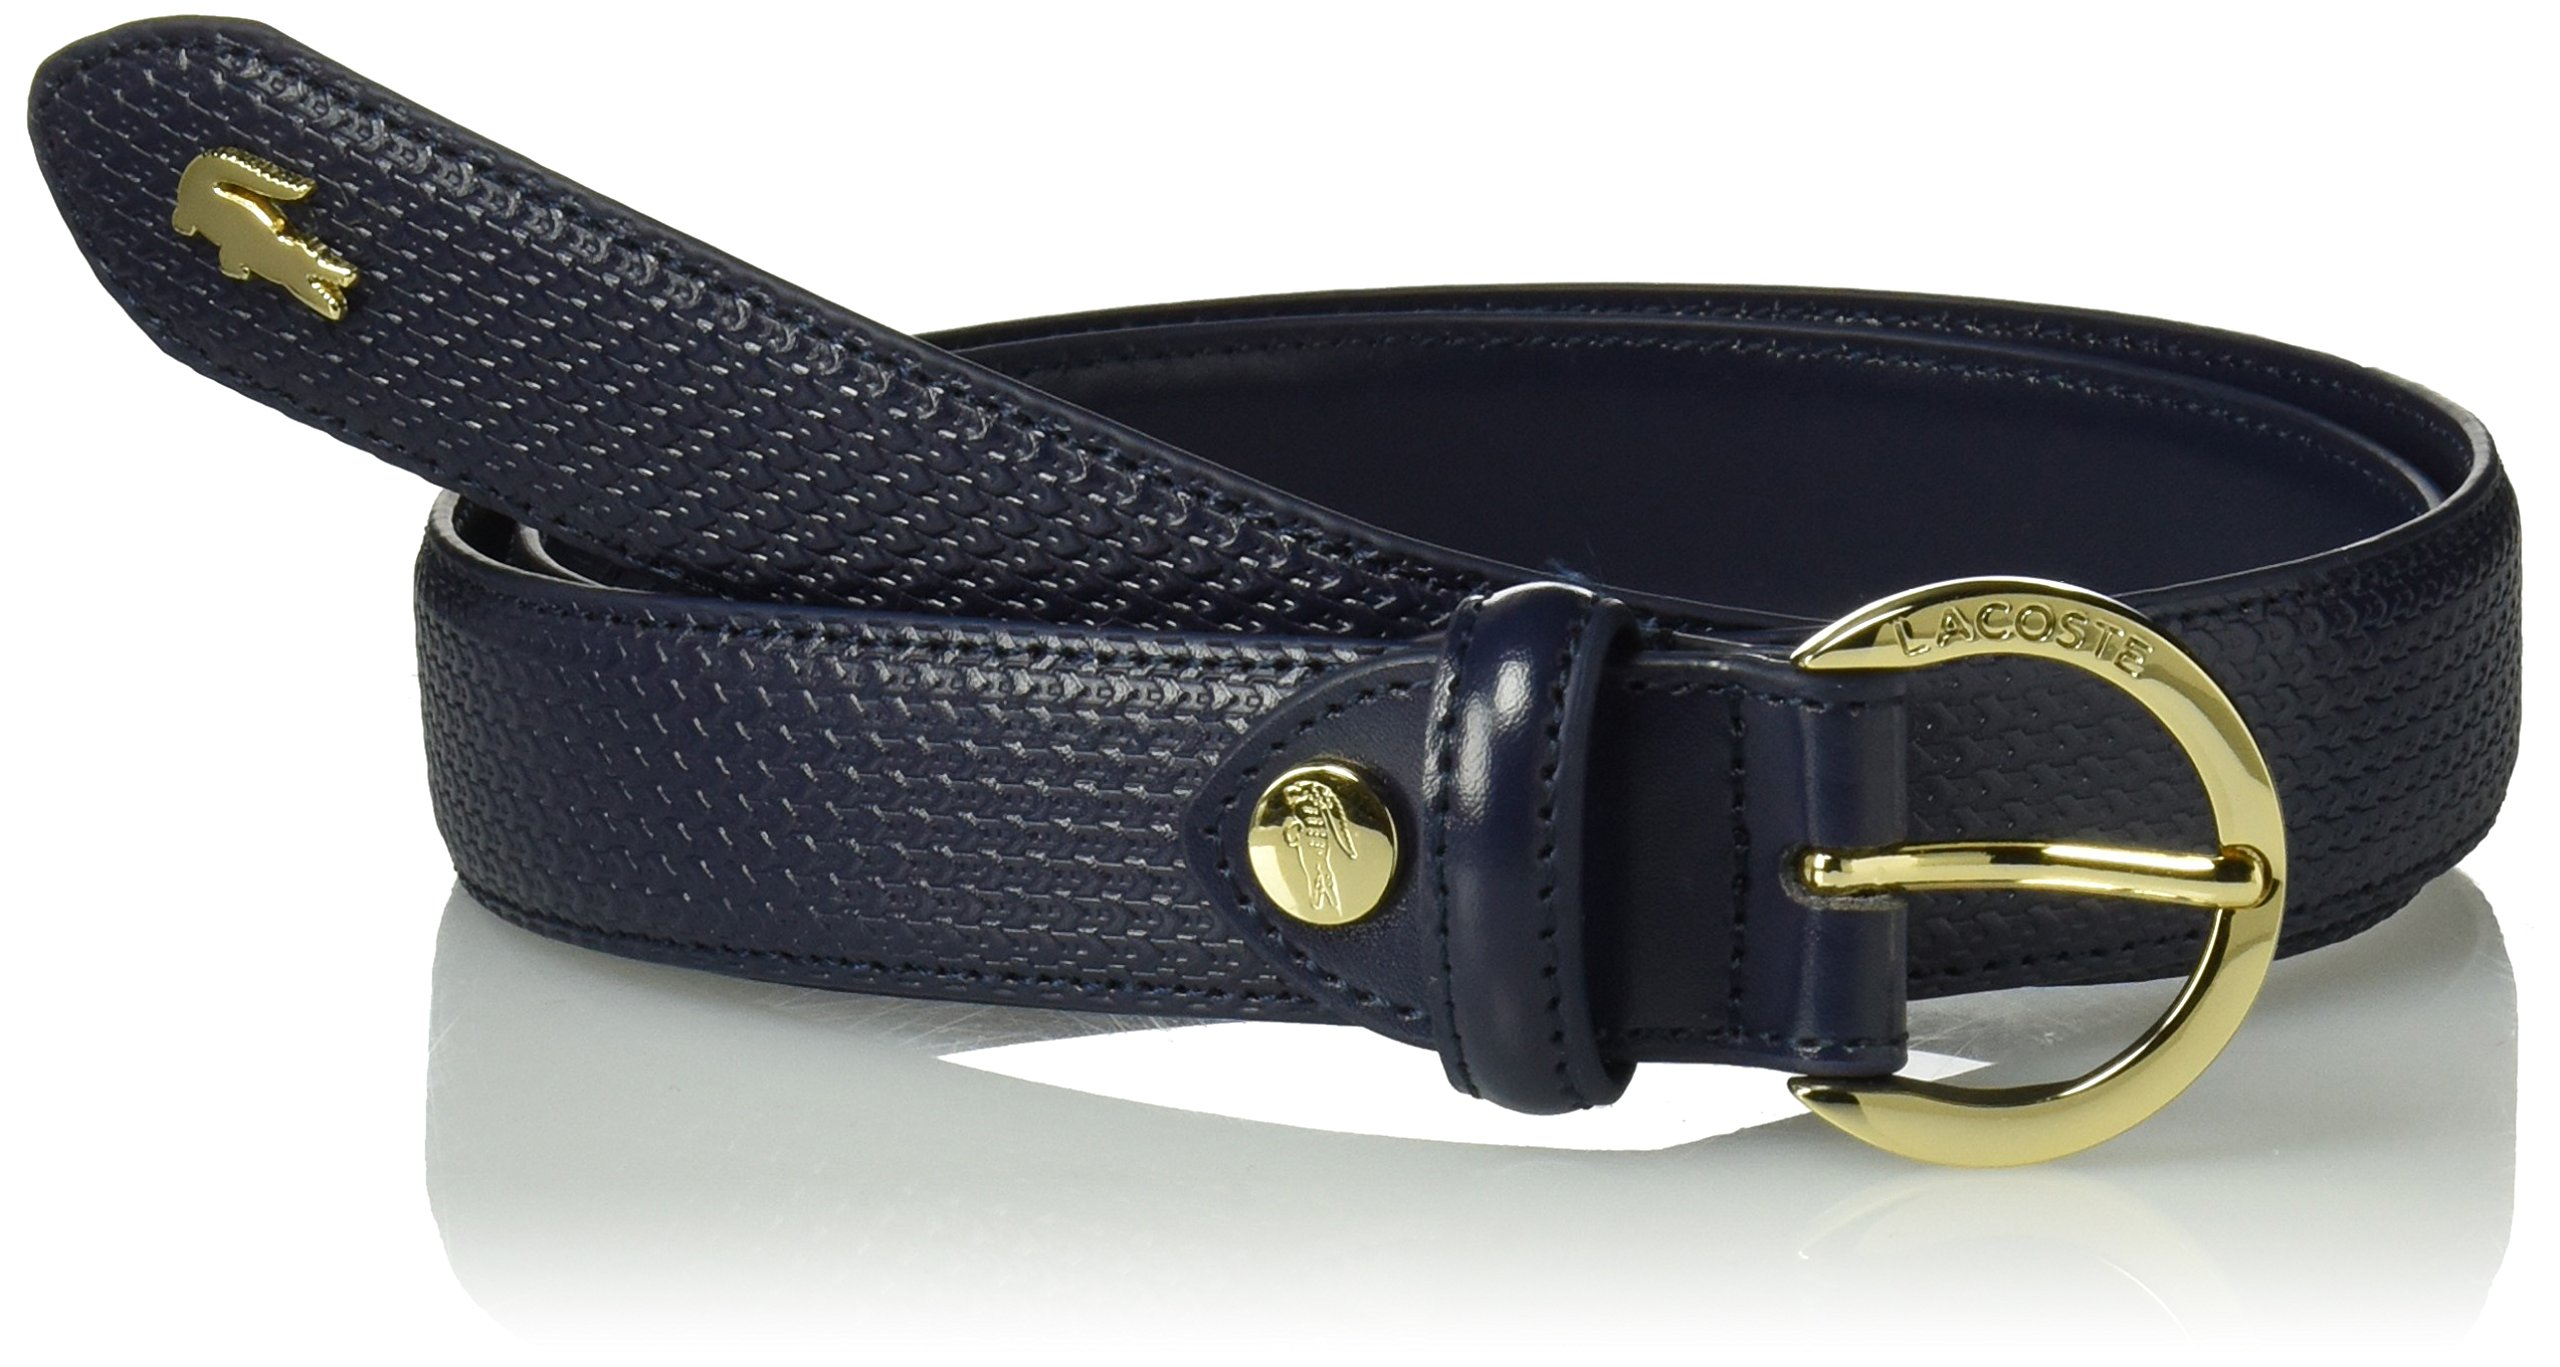 Lacoste Women's Premium Chantaco Leather Belt Accessory, peacoat, 90